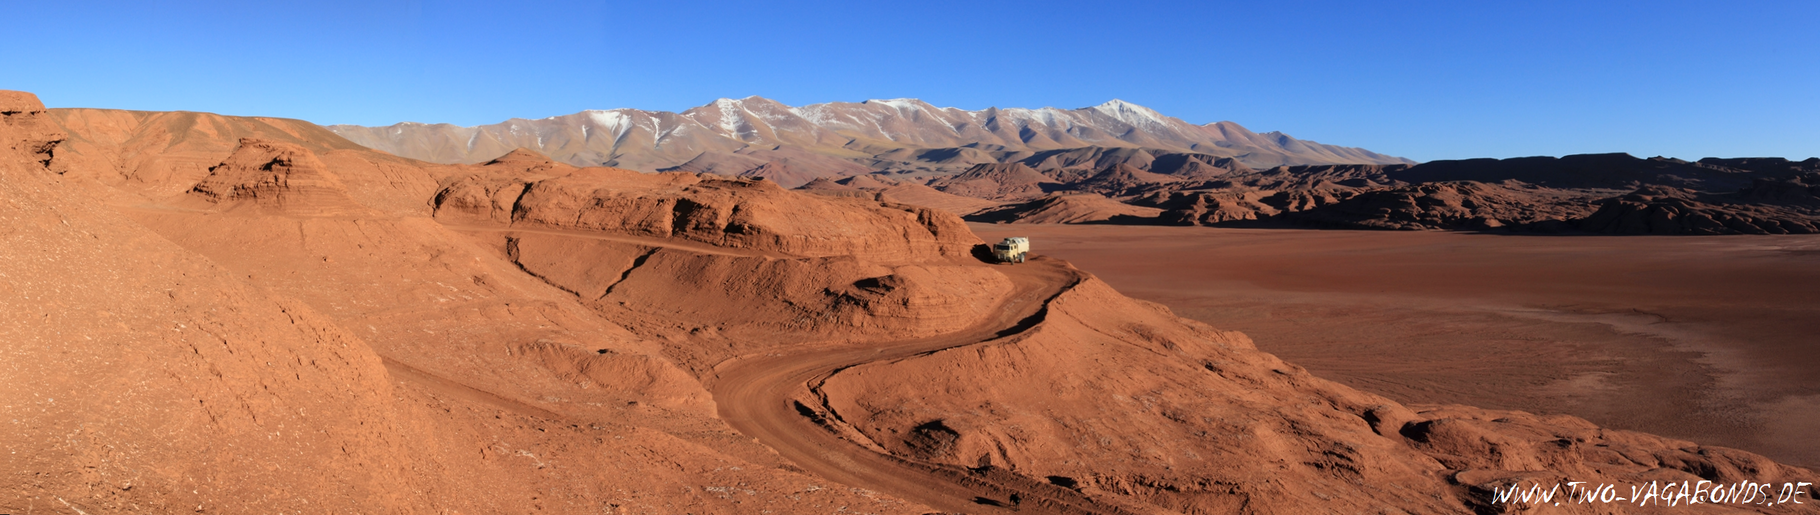 2015 ARGENTINIEN - TOLAR GRANDE